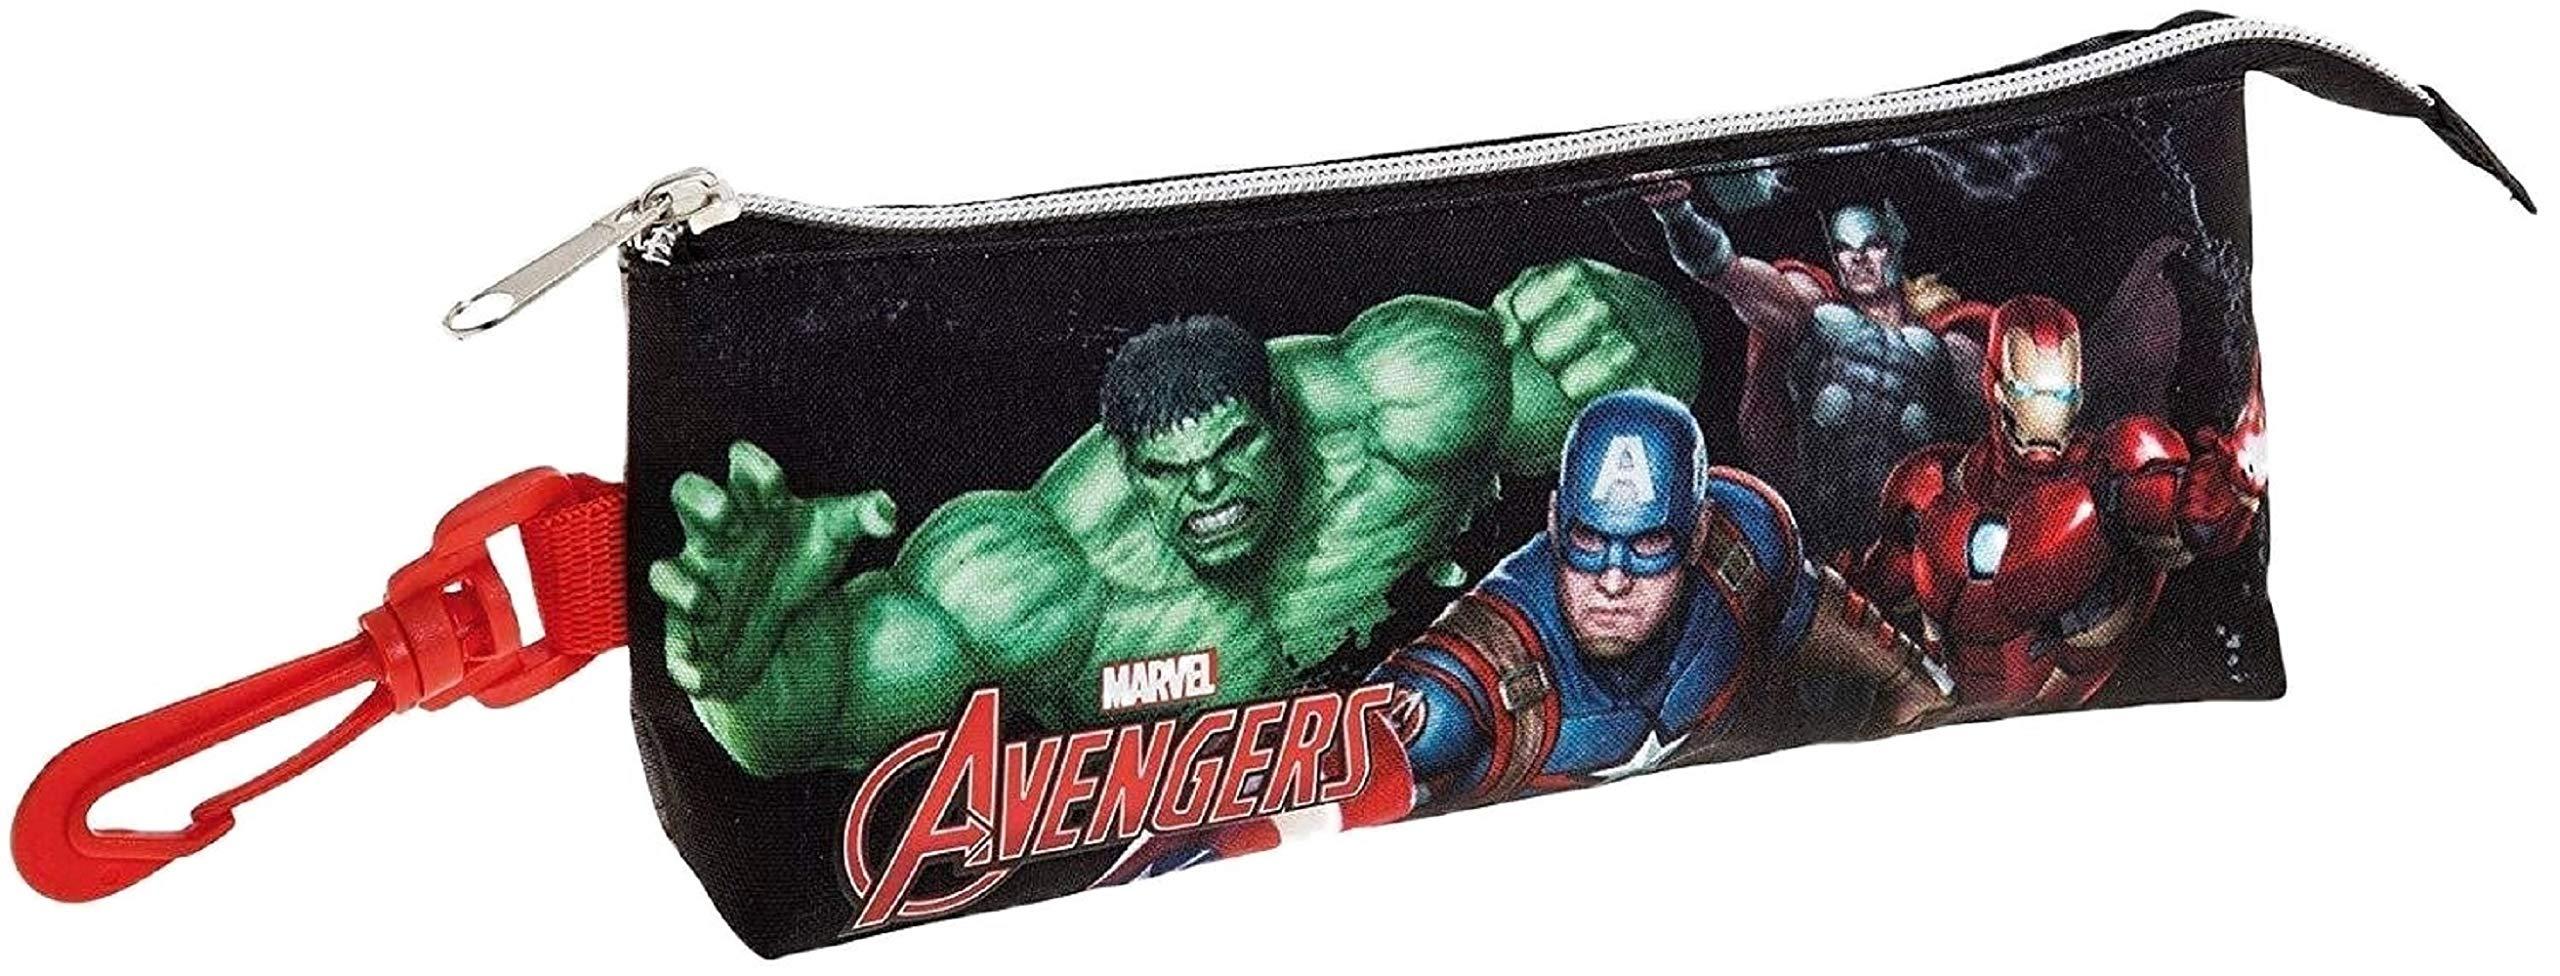 Safta Estuche grande Avengers «Gallery Edition» Oficial Triangular Ovalado 200x50x85mm